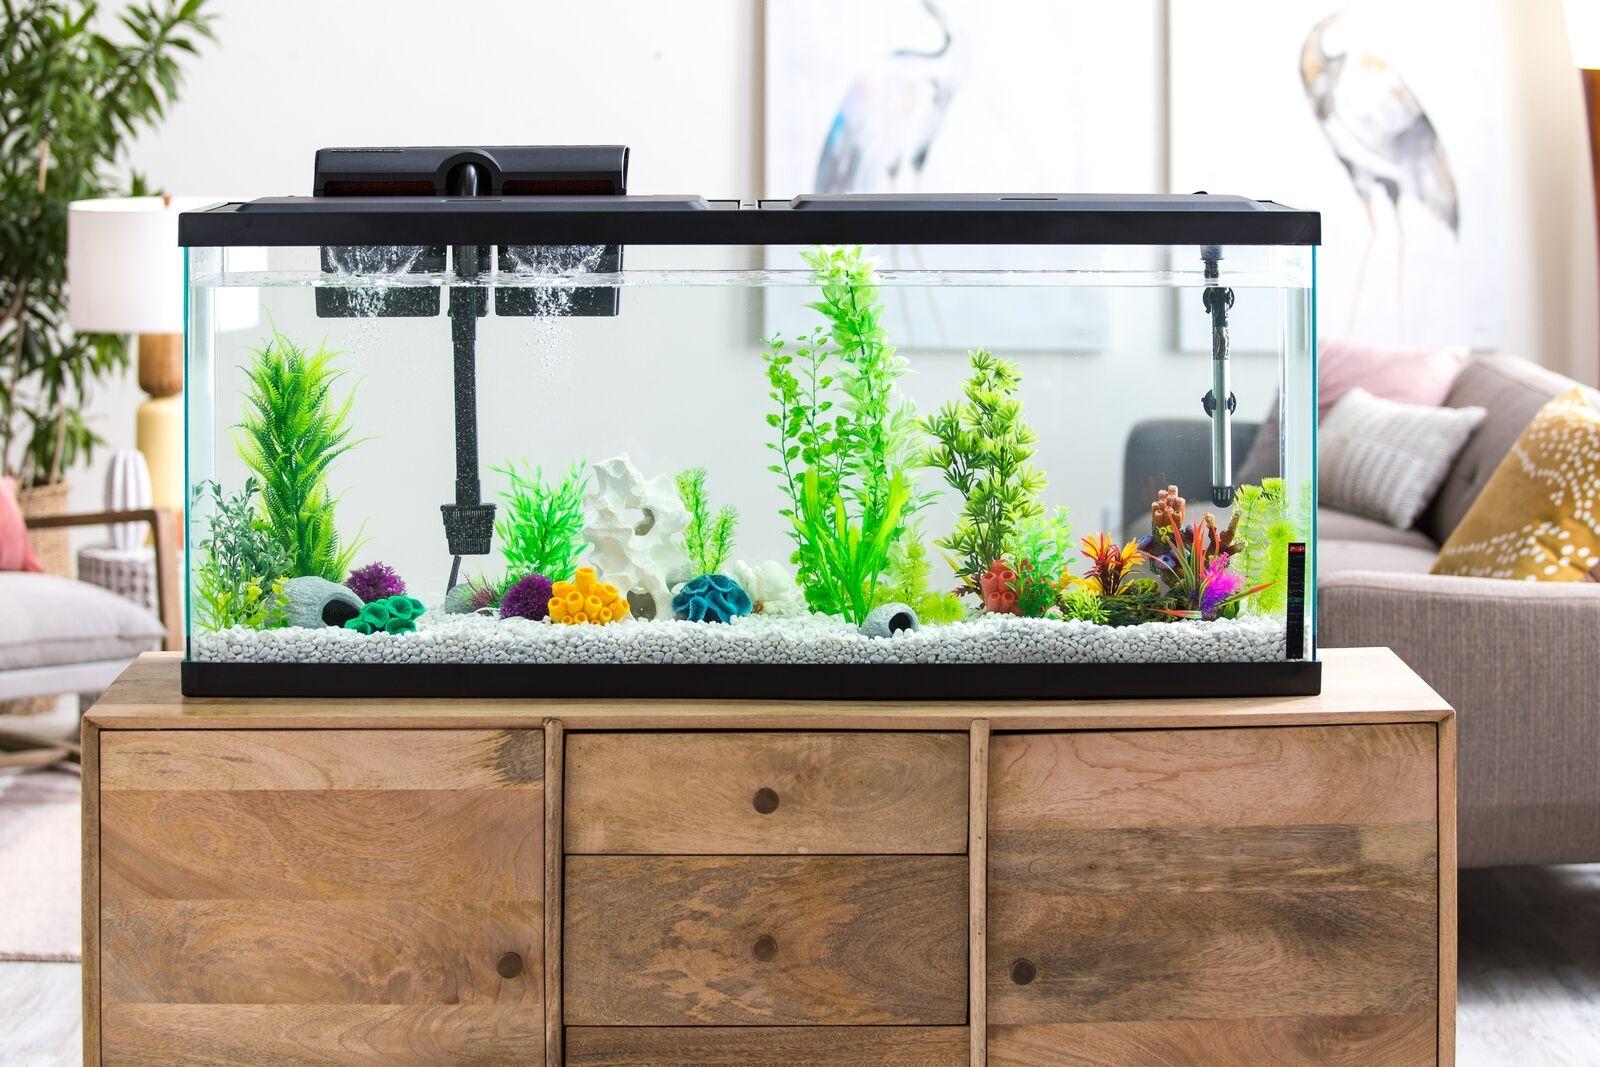 Fish Aquarium 55 Gallon Tank LED Large Starter Kit Fish Tank Powerful Filter Day